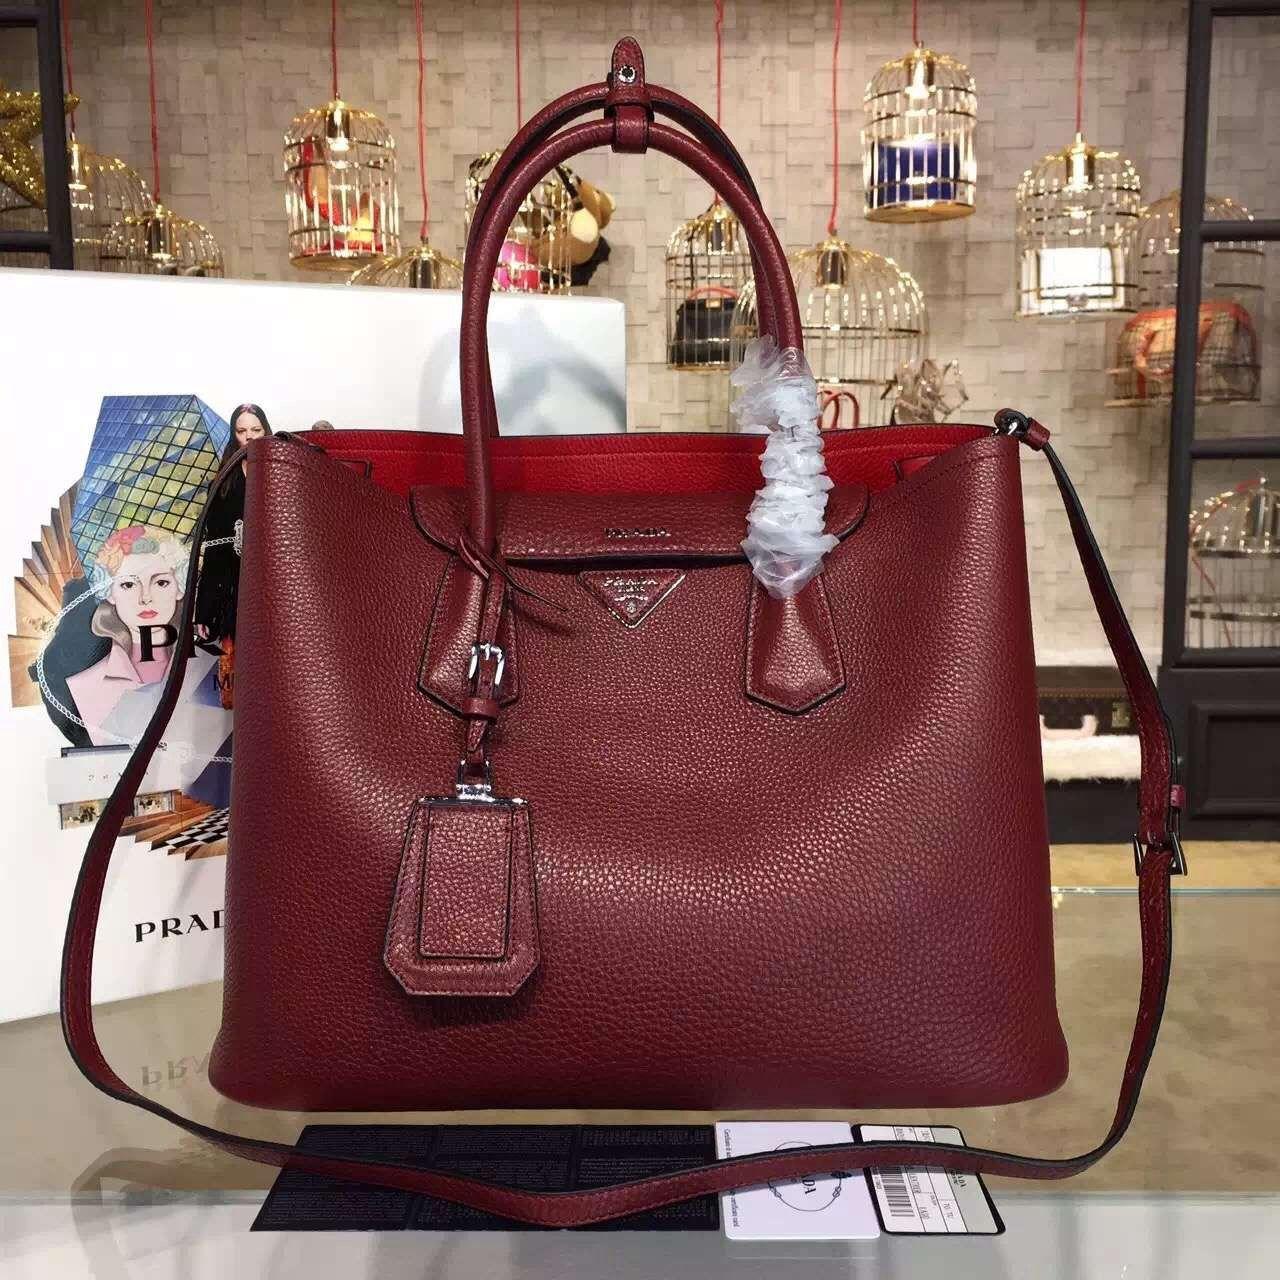 ... netherlands prada 1bg007 calf leather double bag 2016 5e751 68114 2a536db1f5273